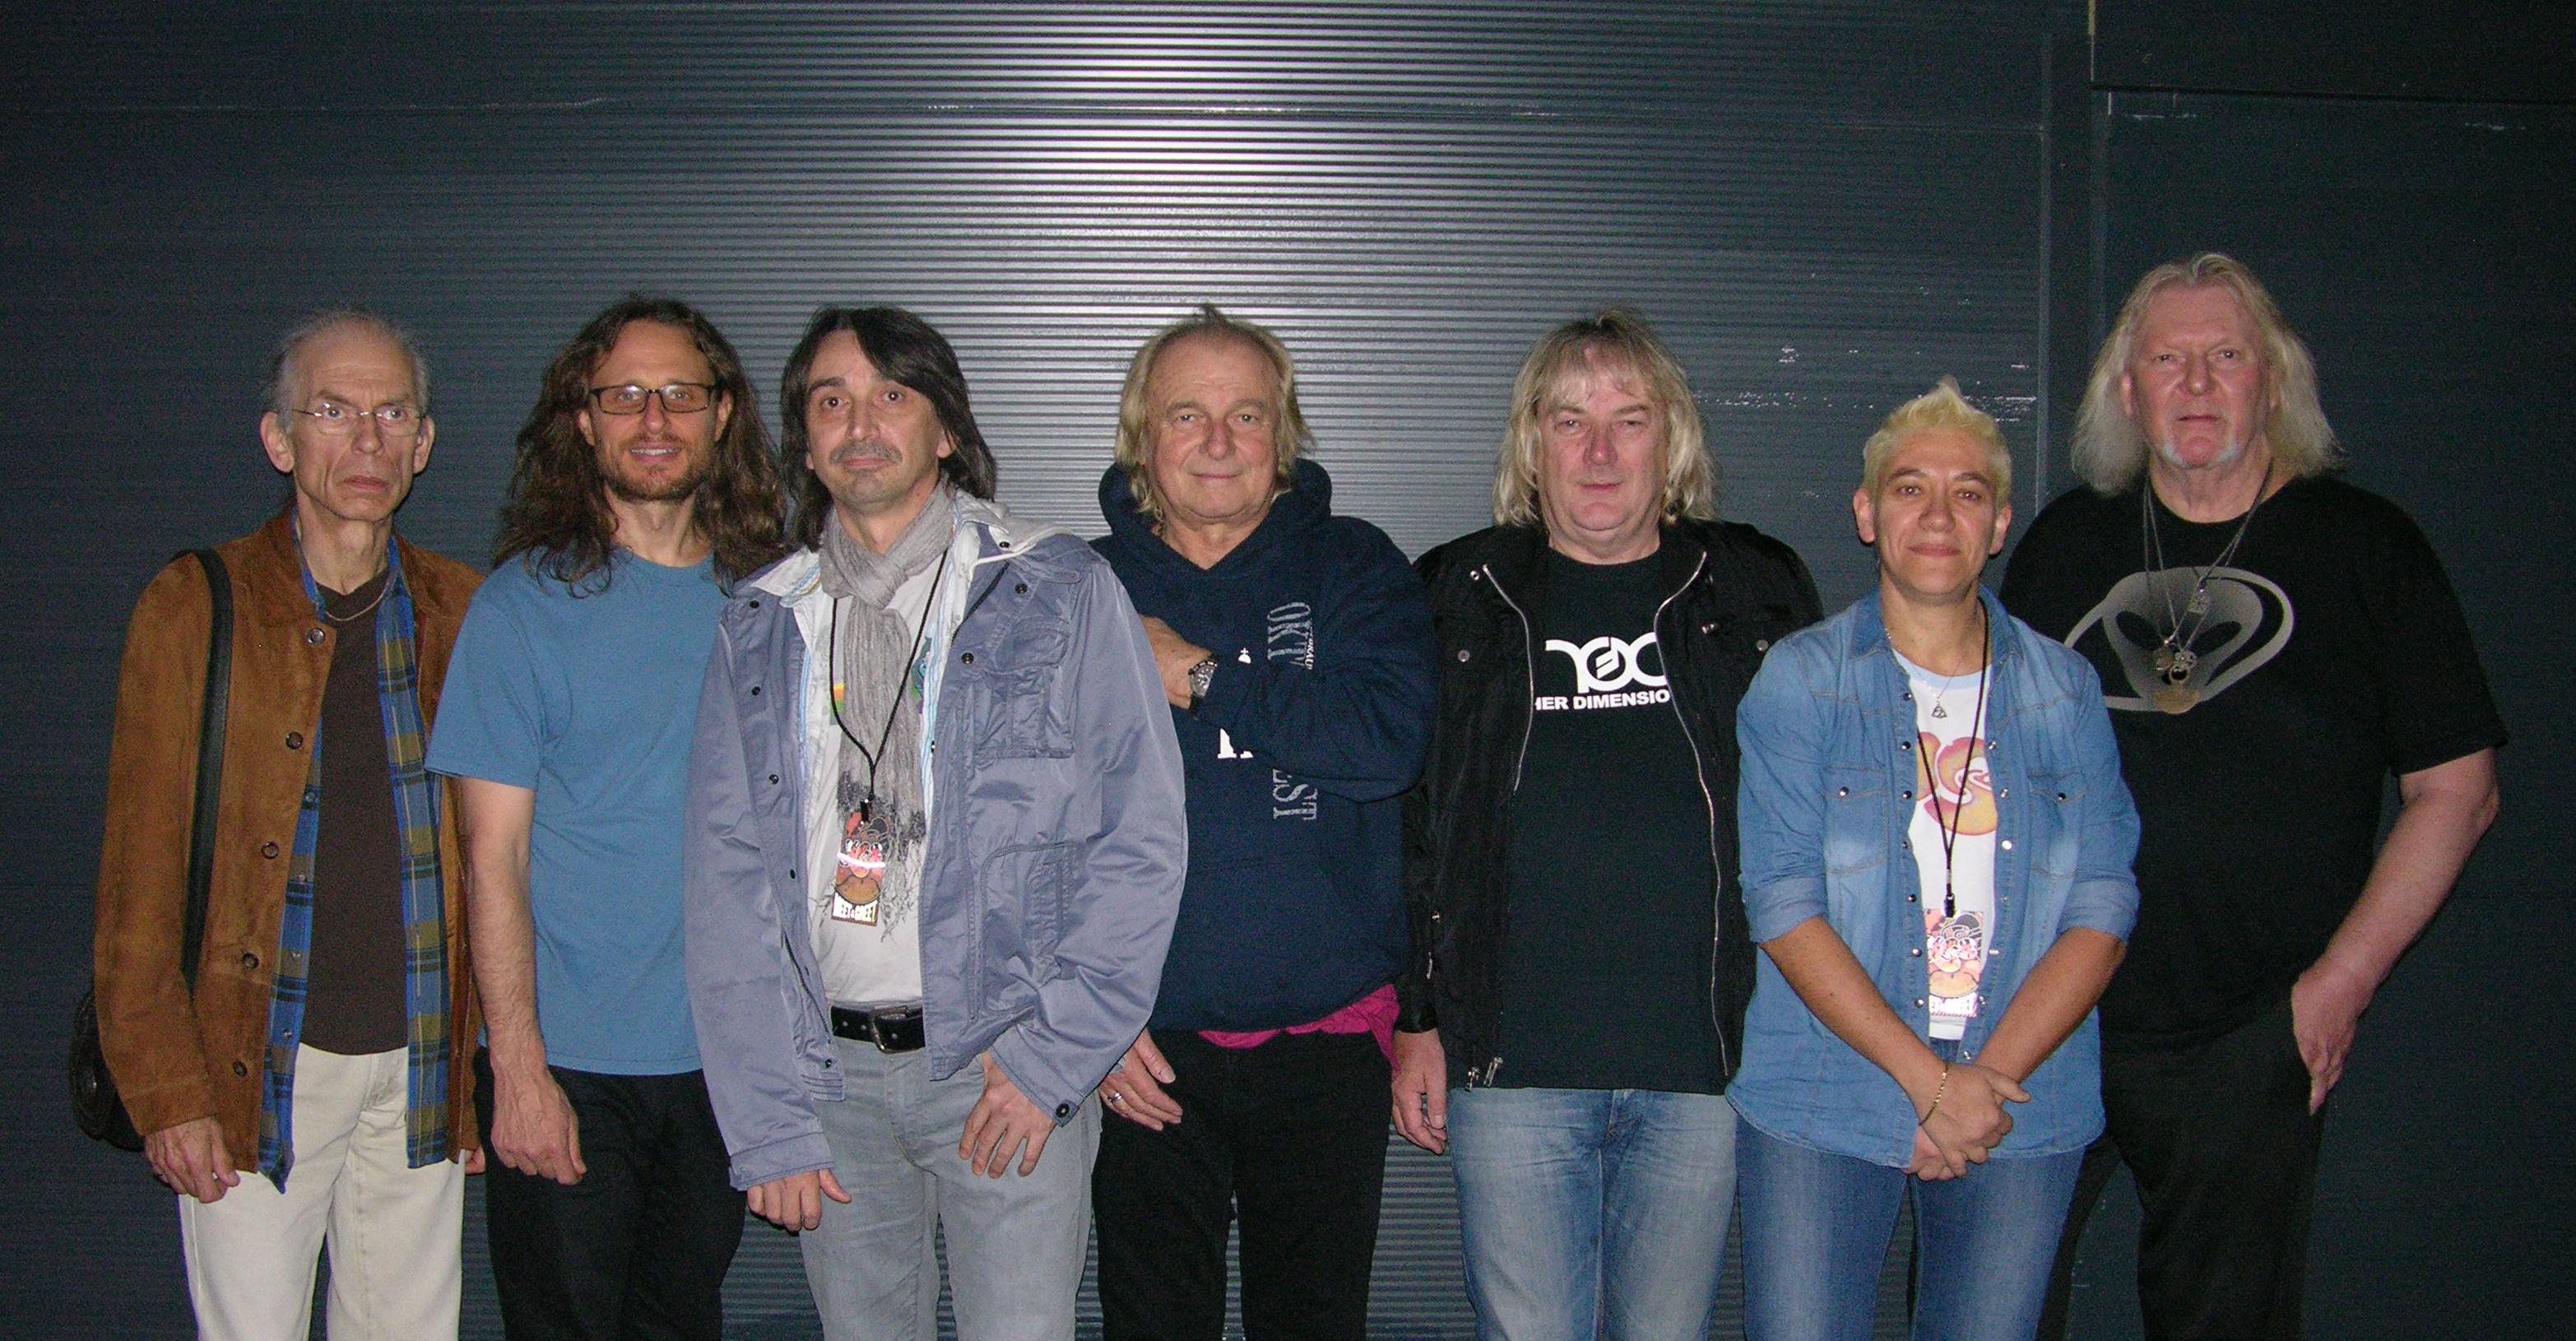 Gli YES, l'uomo di blues e la groupie - da sx a dx STEVE HOWE, JON DAVISON, TT, ALAN WHITE, GEOFF DOWNES, la groupie, CHRIS SQUIRE (foto di Alan)